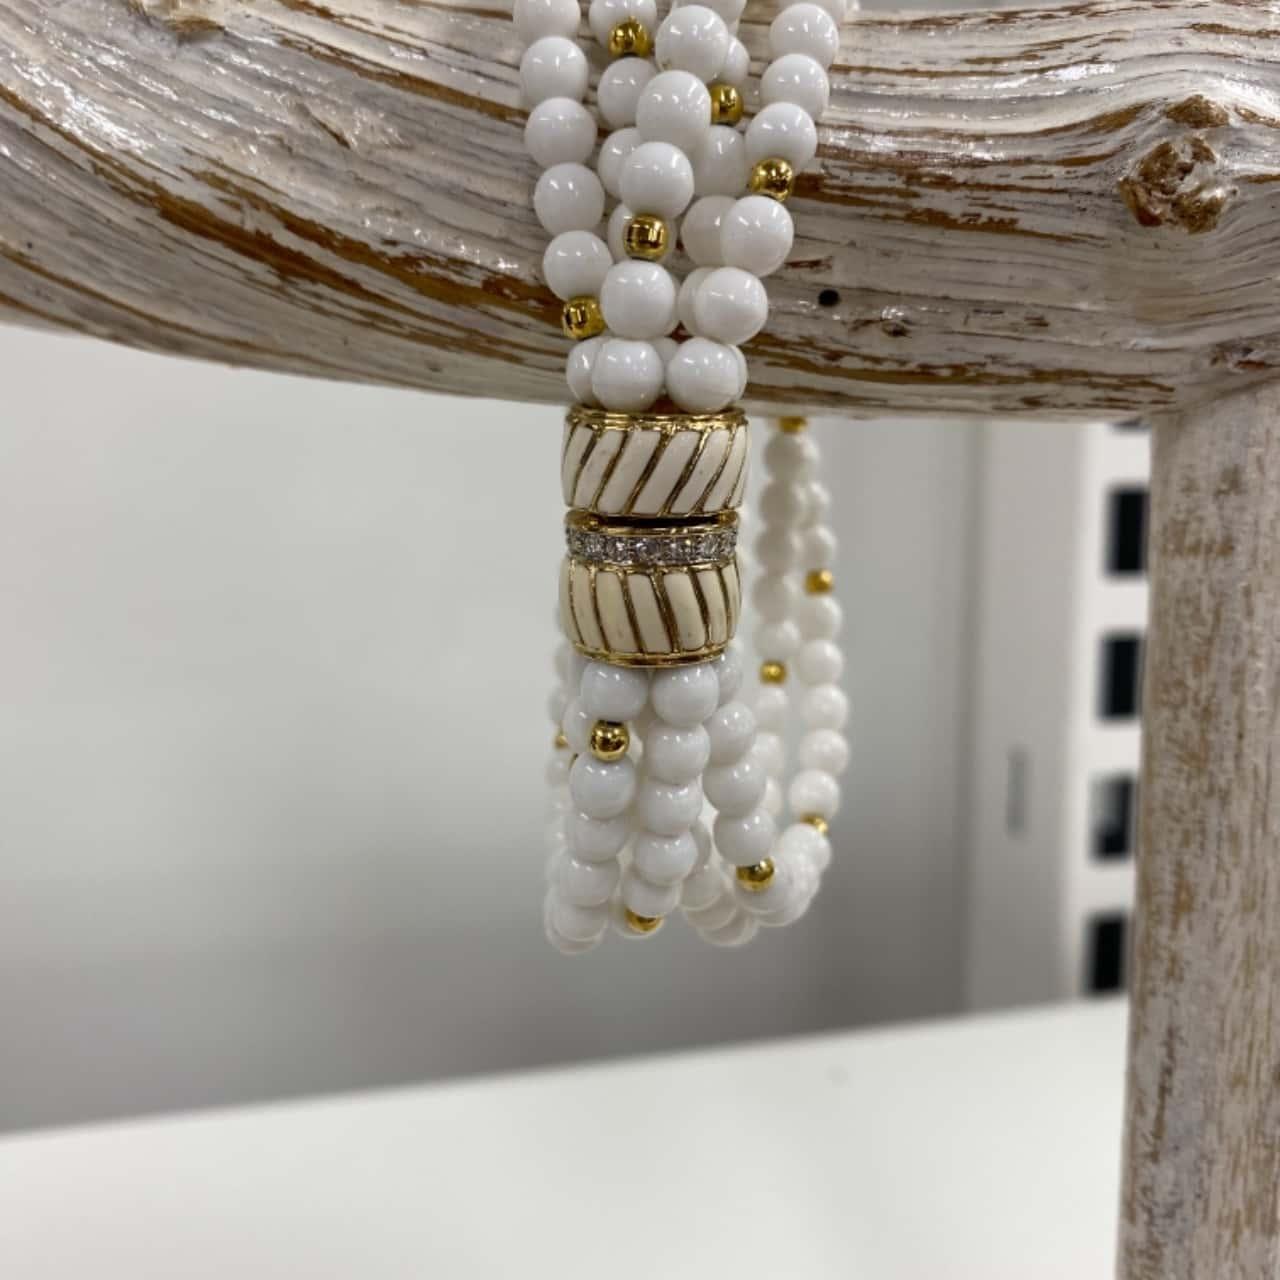 Vintage ECHT 2 PRYM Necklace & Bracelet With Snap Clasp